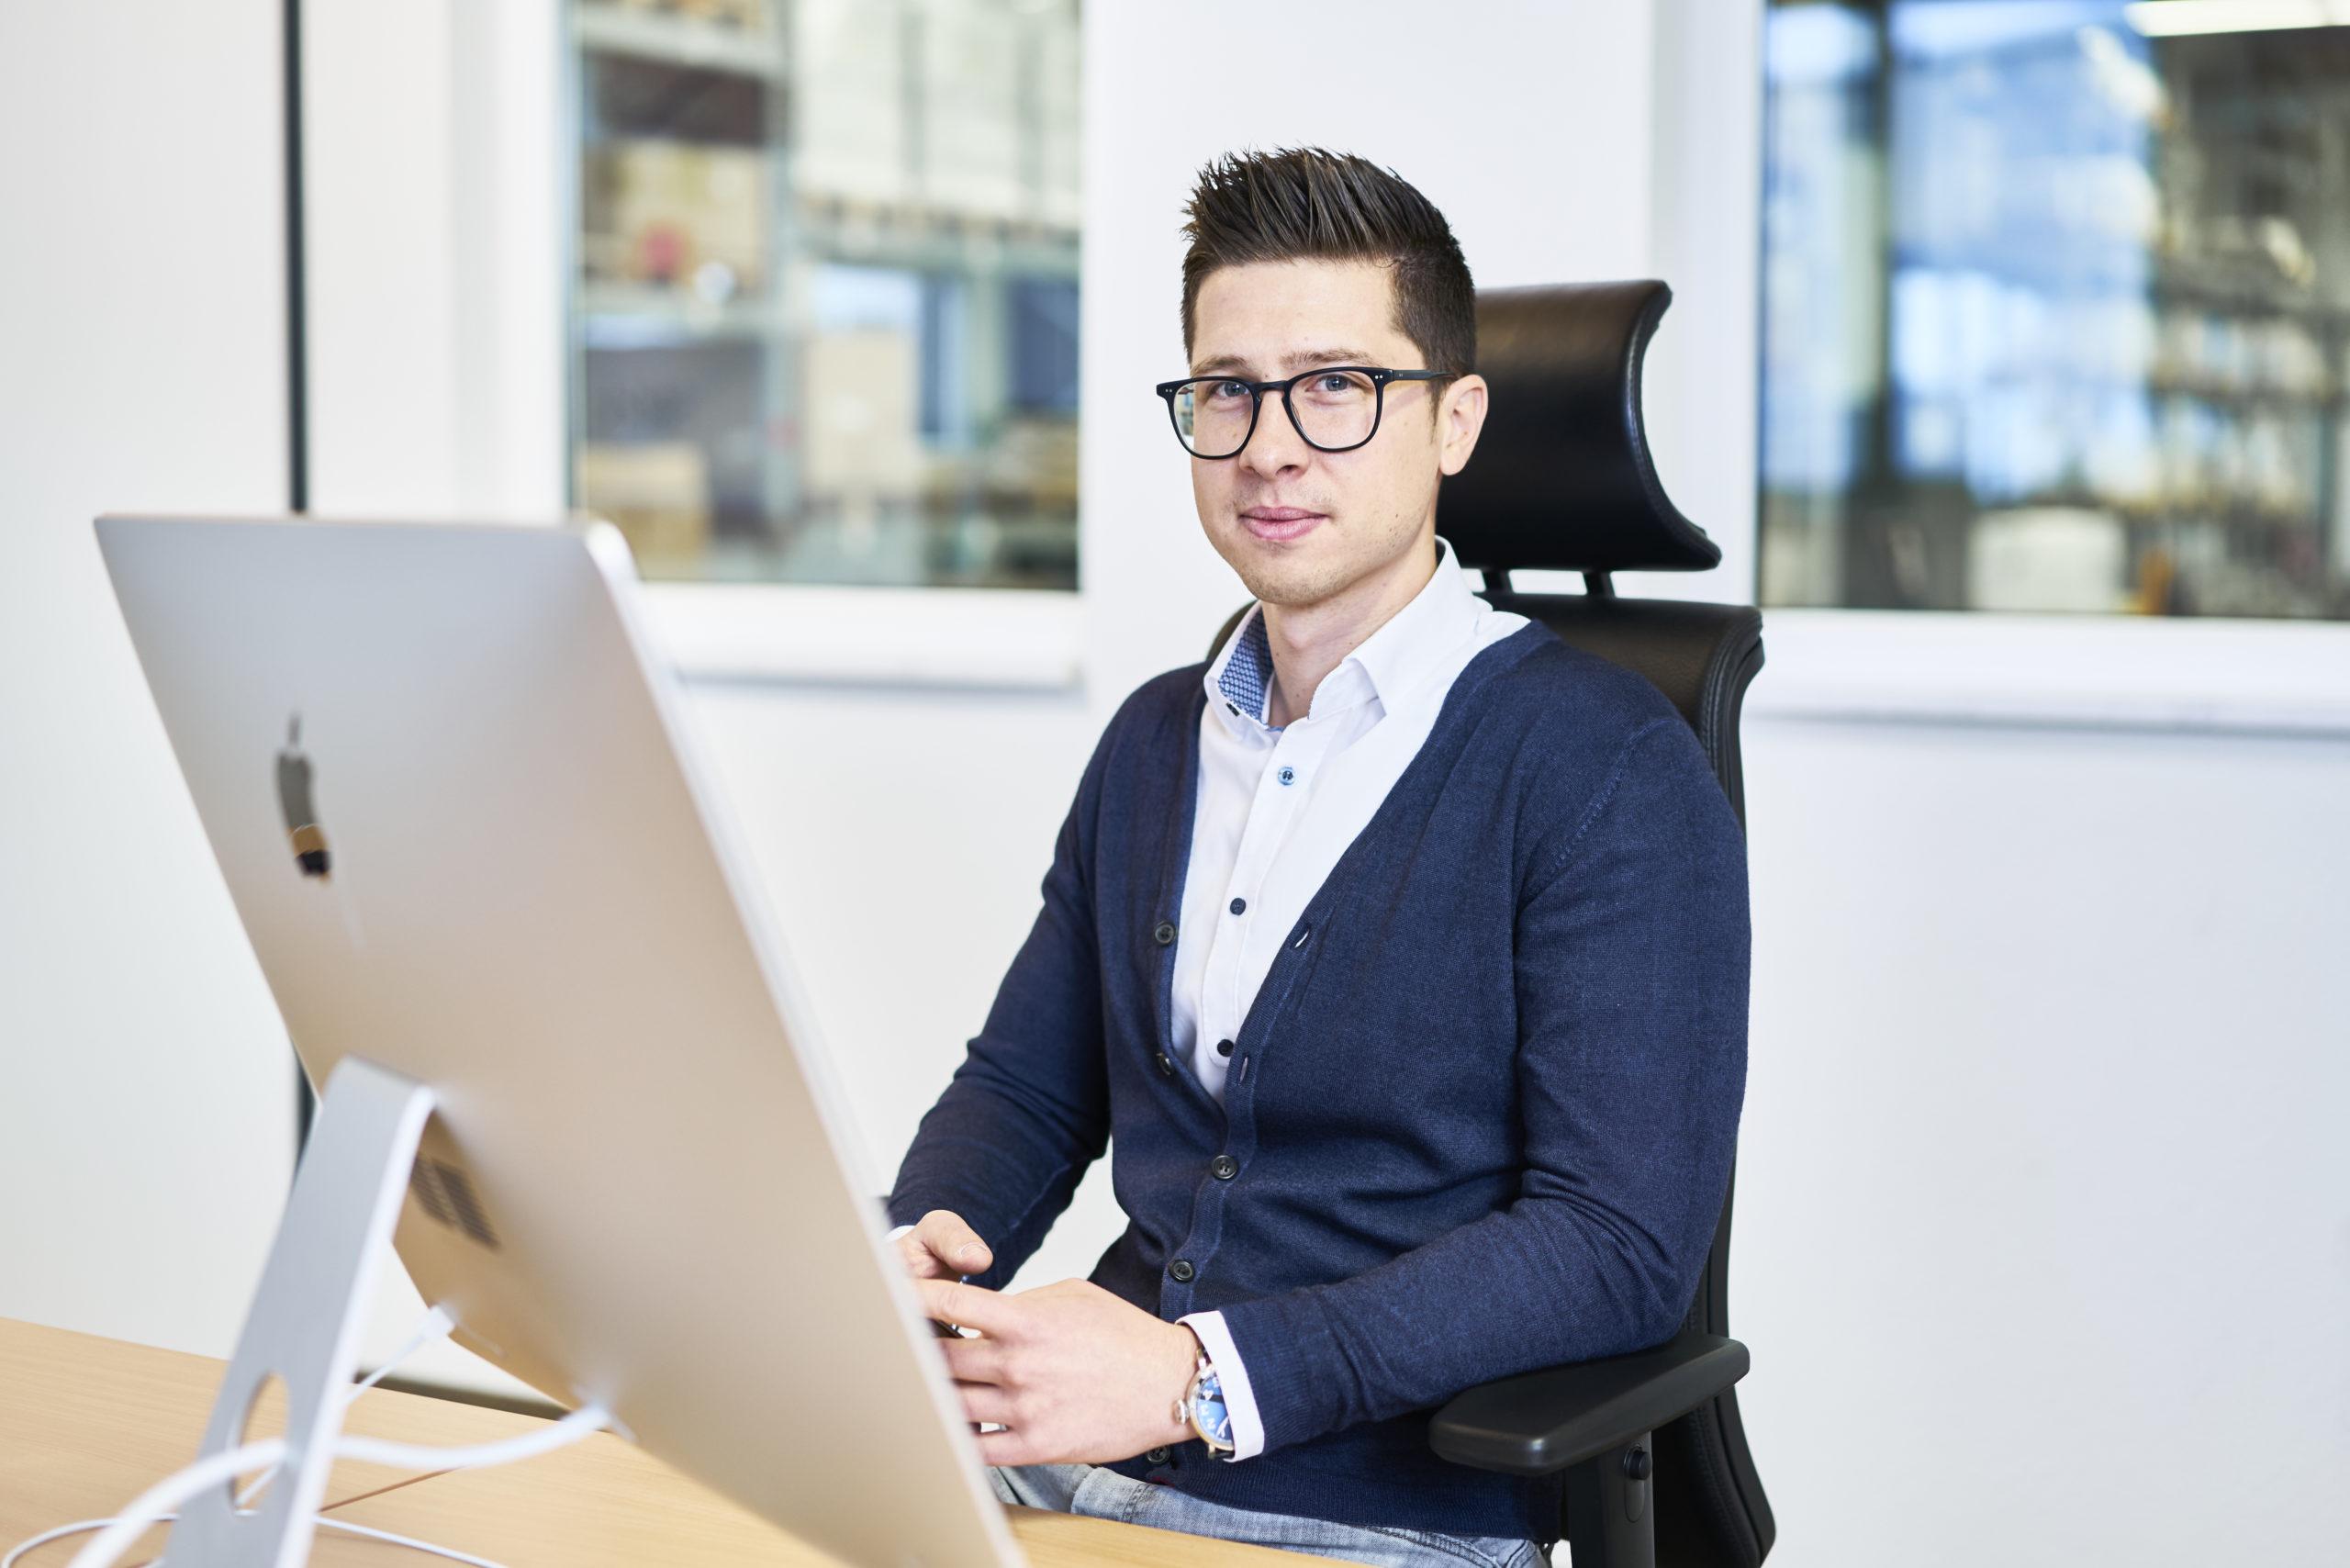 Thorsten Kindler-Geschäftsführender Gesellschafter-Kinderl Etiketten-Endingen am Kaiserstuhl